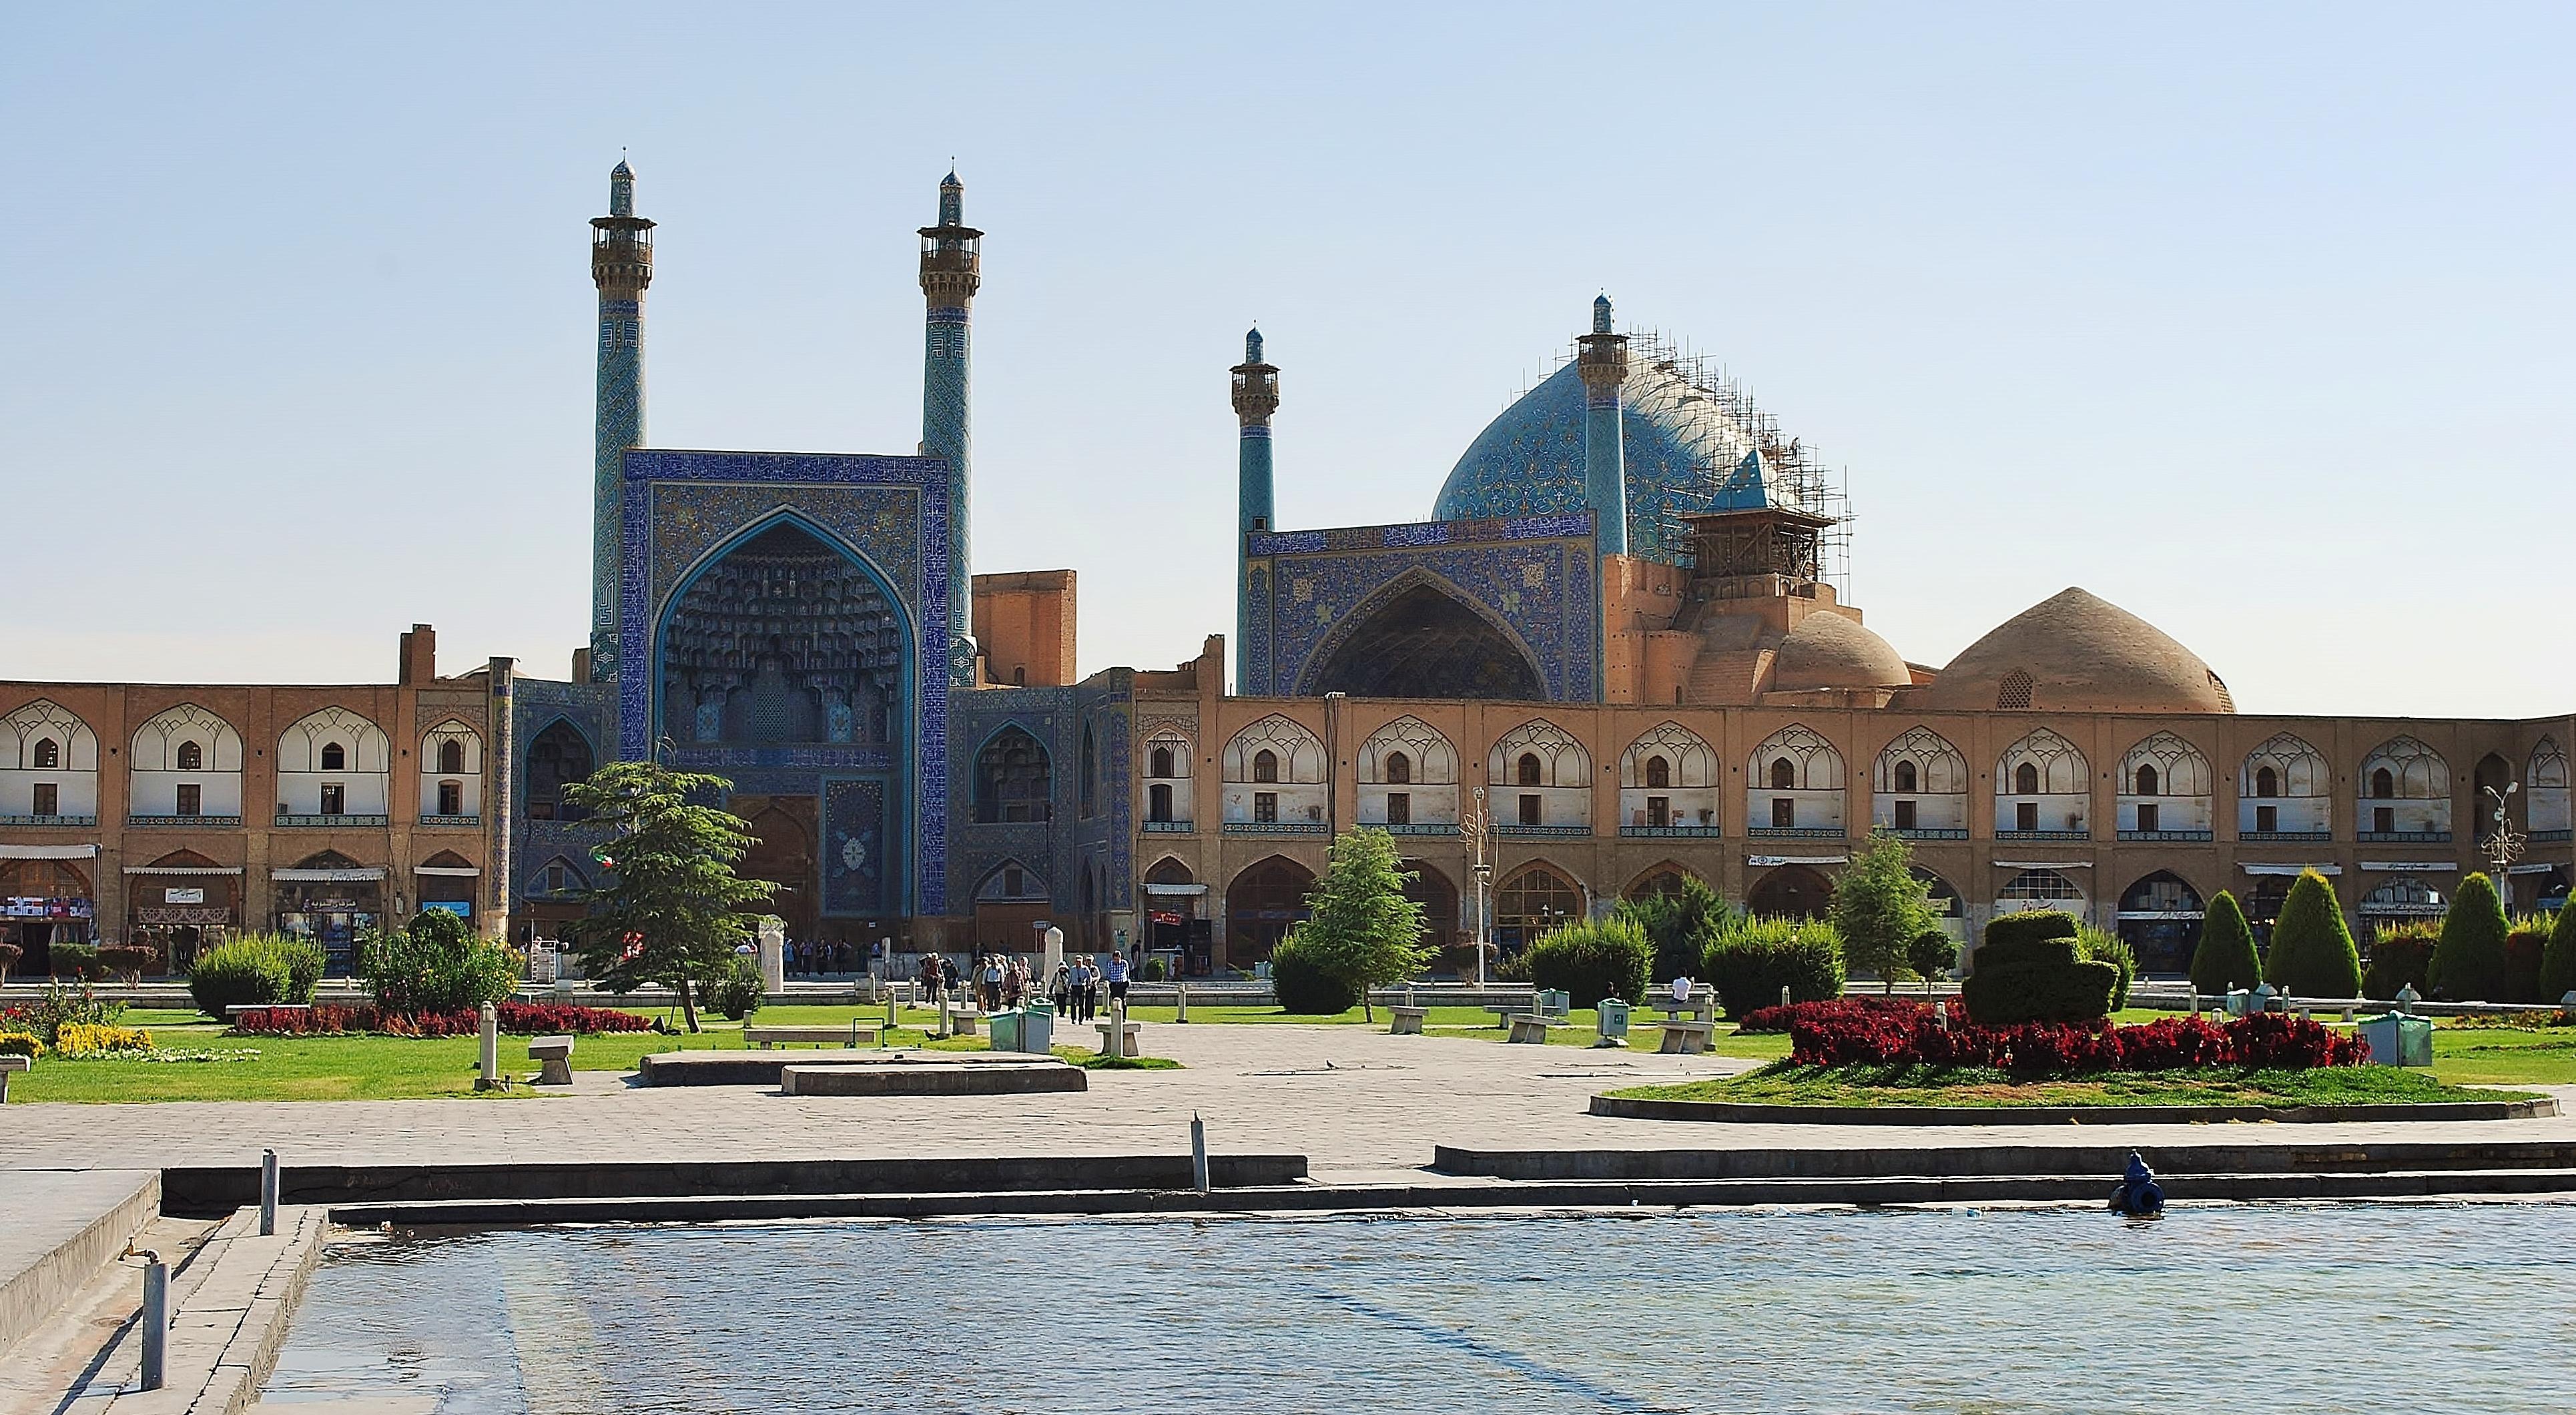 Iran; Esfahan - meczet na Placu Chomeiniego.